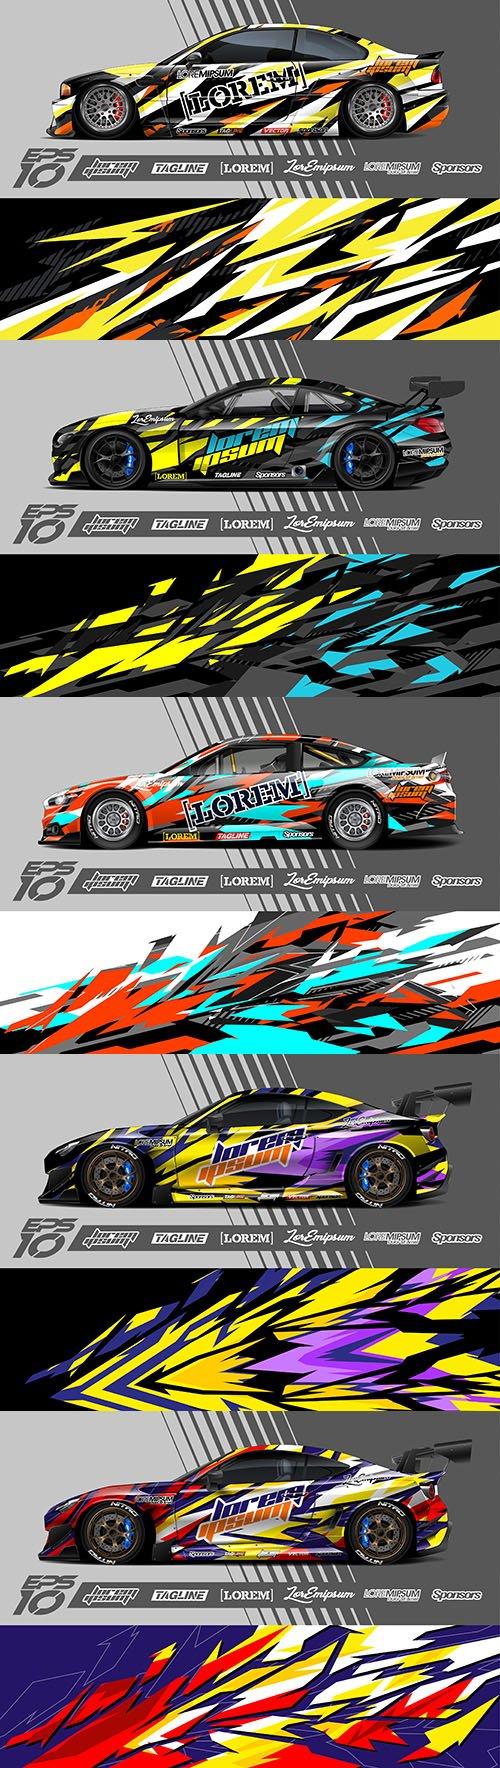 Racing sports car design sticker illustration